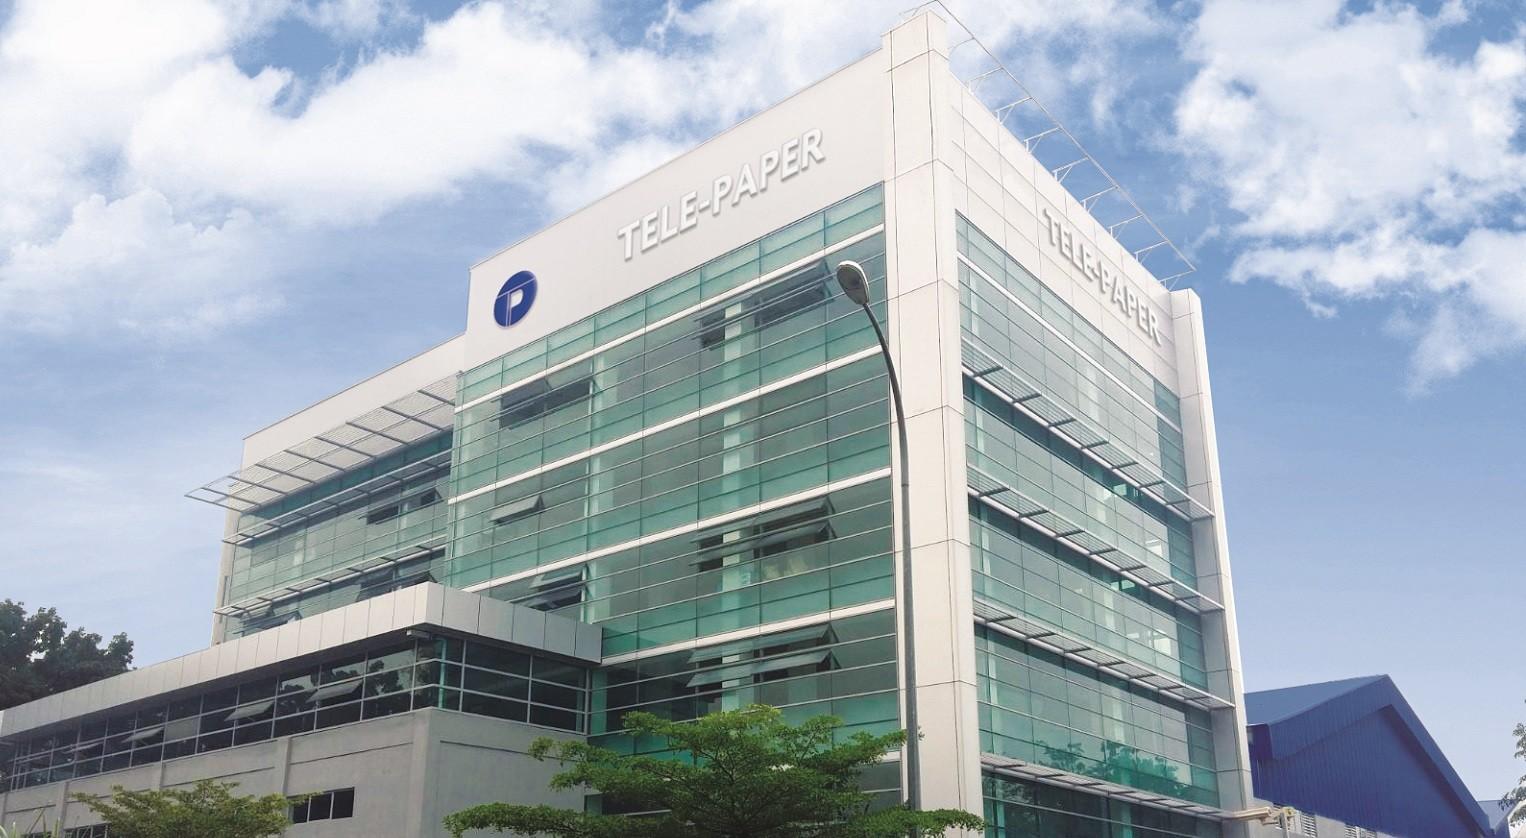 Tele-Paper (M) Sdn Bhd | LinkedIn